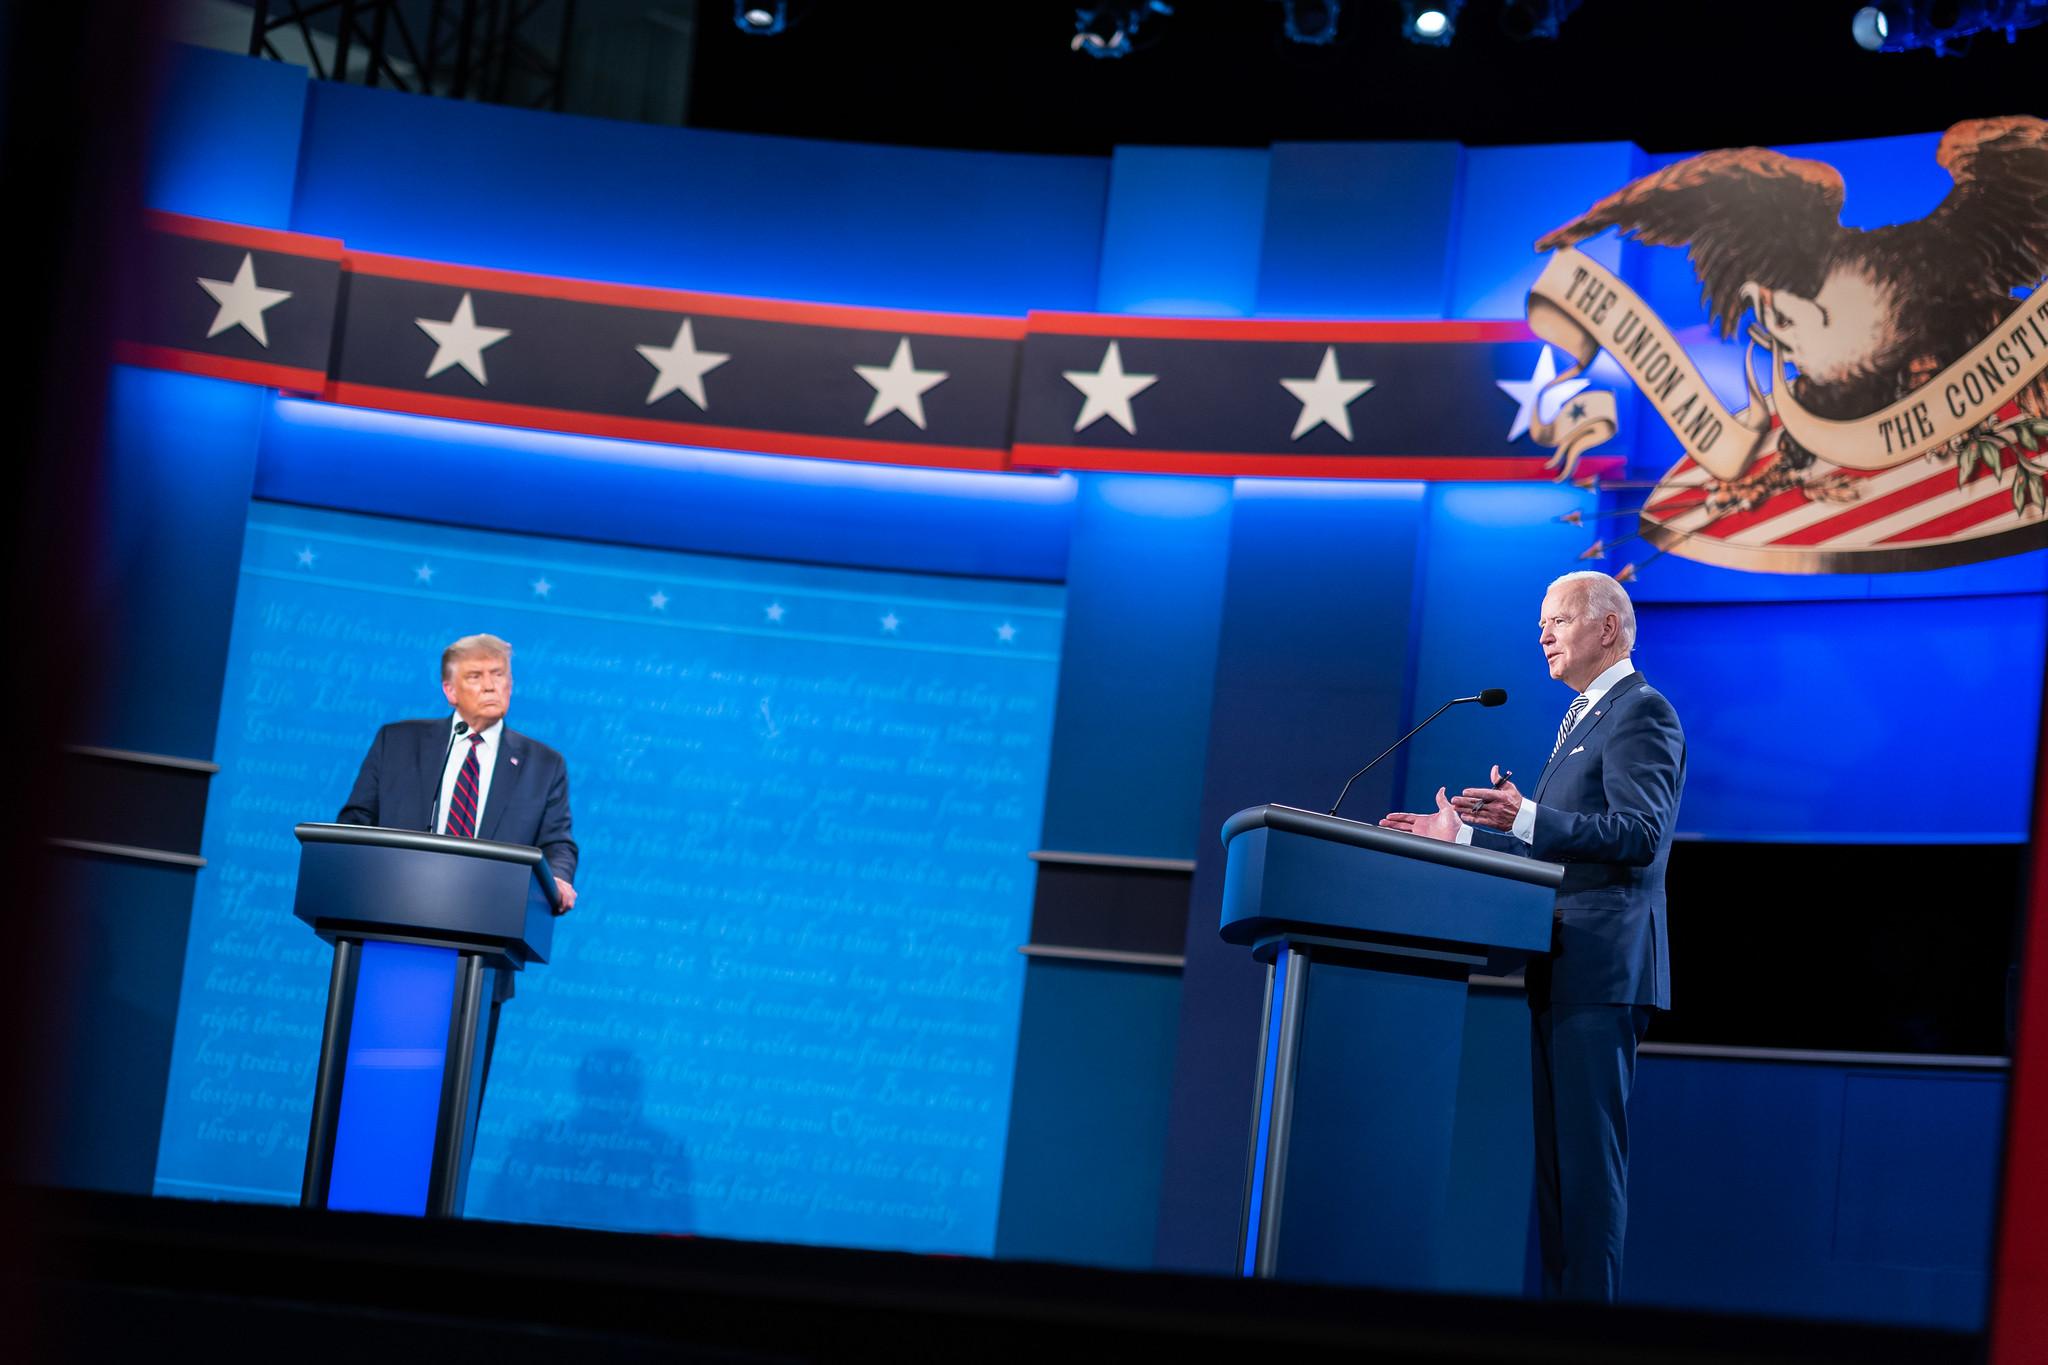 President Trump and former Vice President Joe Biden at the presidential debate.